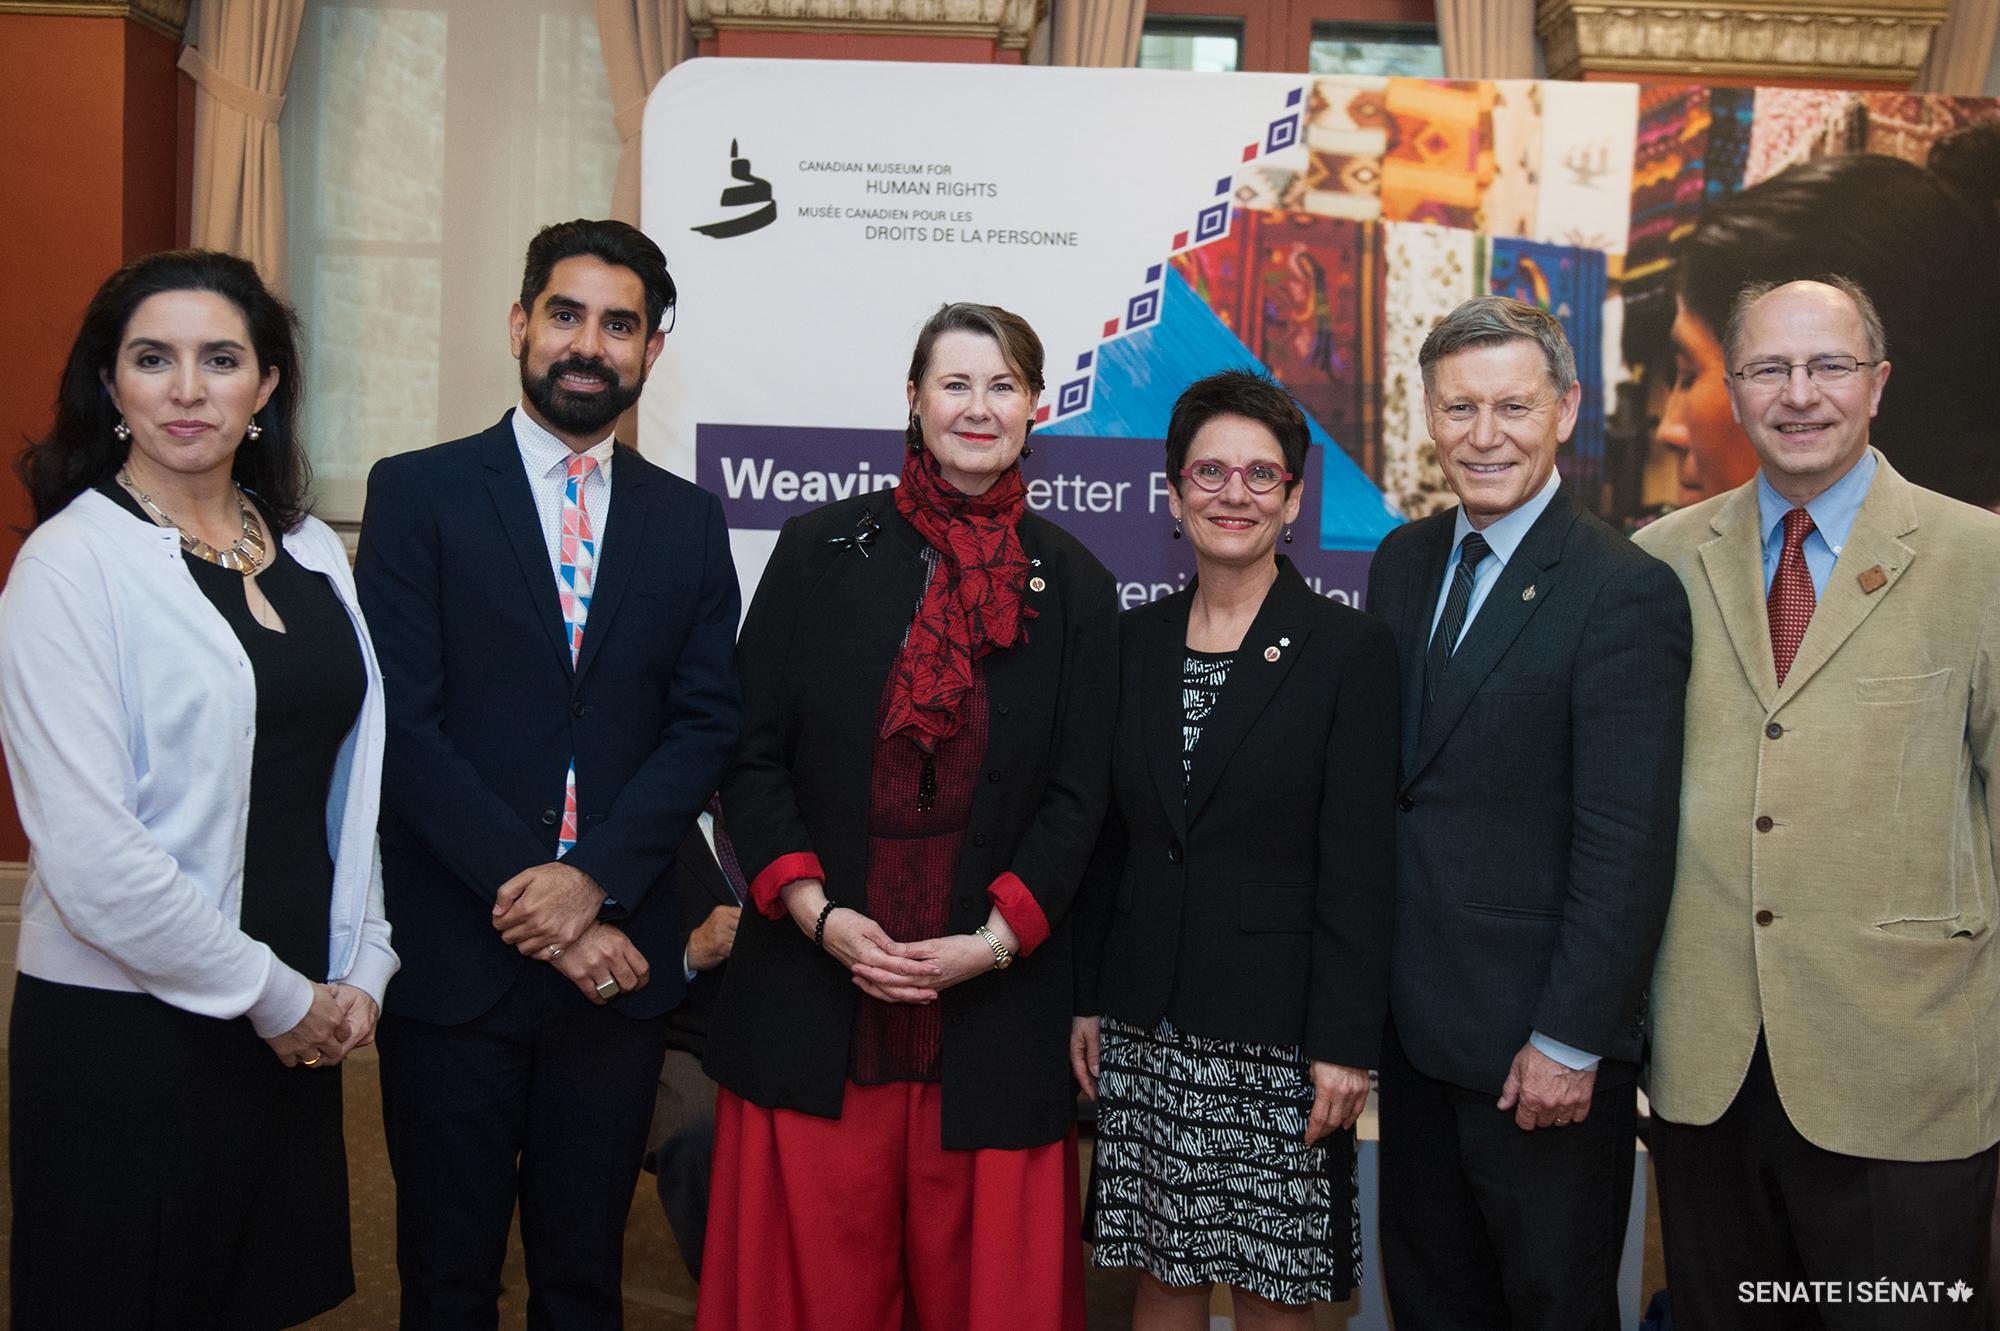 Viviana Fernandez, Armando Perla, Hon. Marilou McPhedran, Hon. Raymonde Gagné, Parliamentary Secretary Terry Duguid M.P. & John Packer